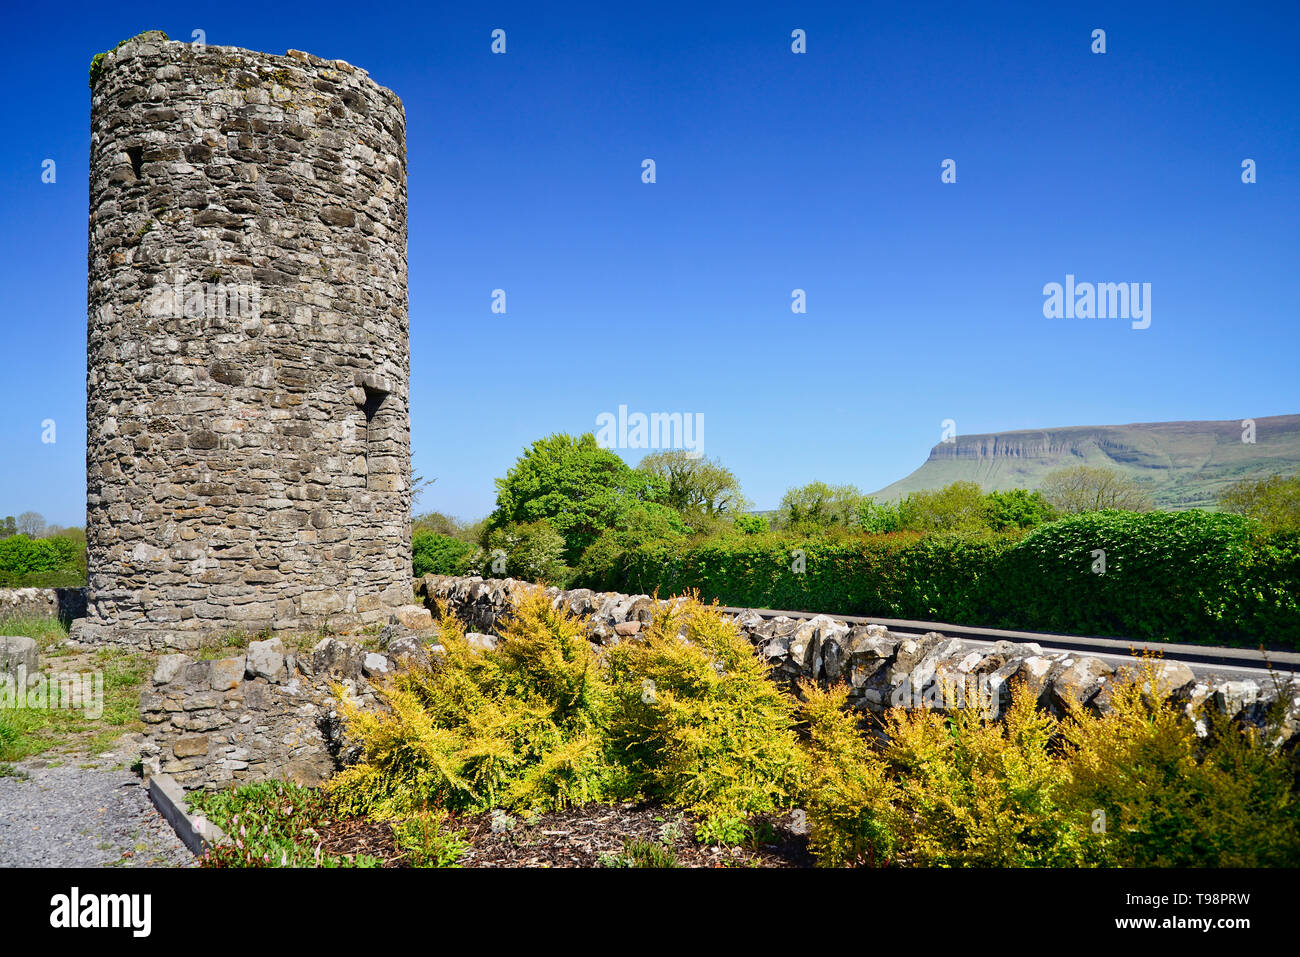 Ireland, County Sligo, Drumcliffe, Stump of Round Tower with Ben Bulben mountain in the background. - Stock Image